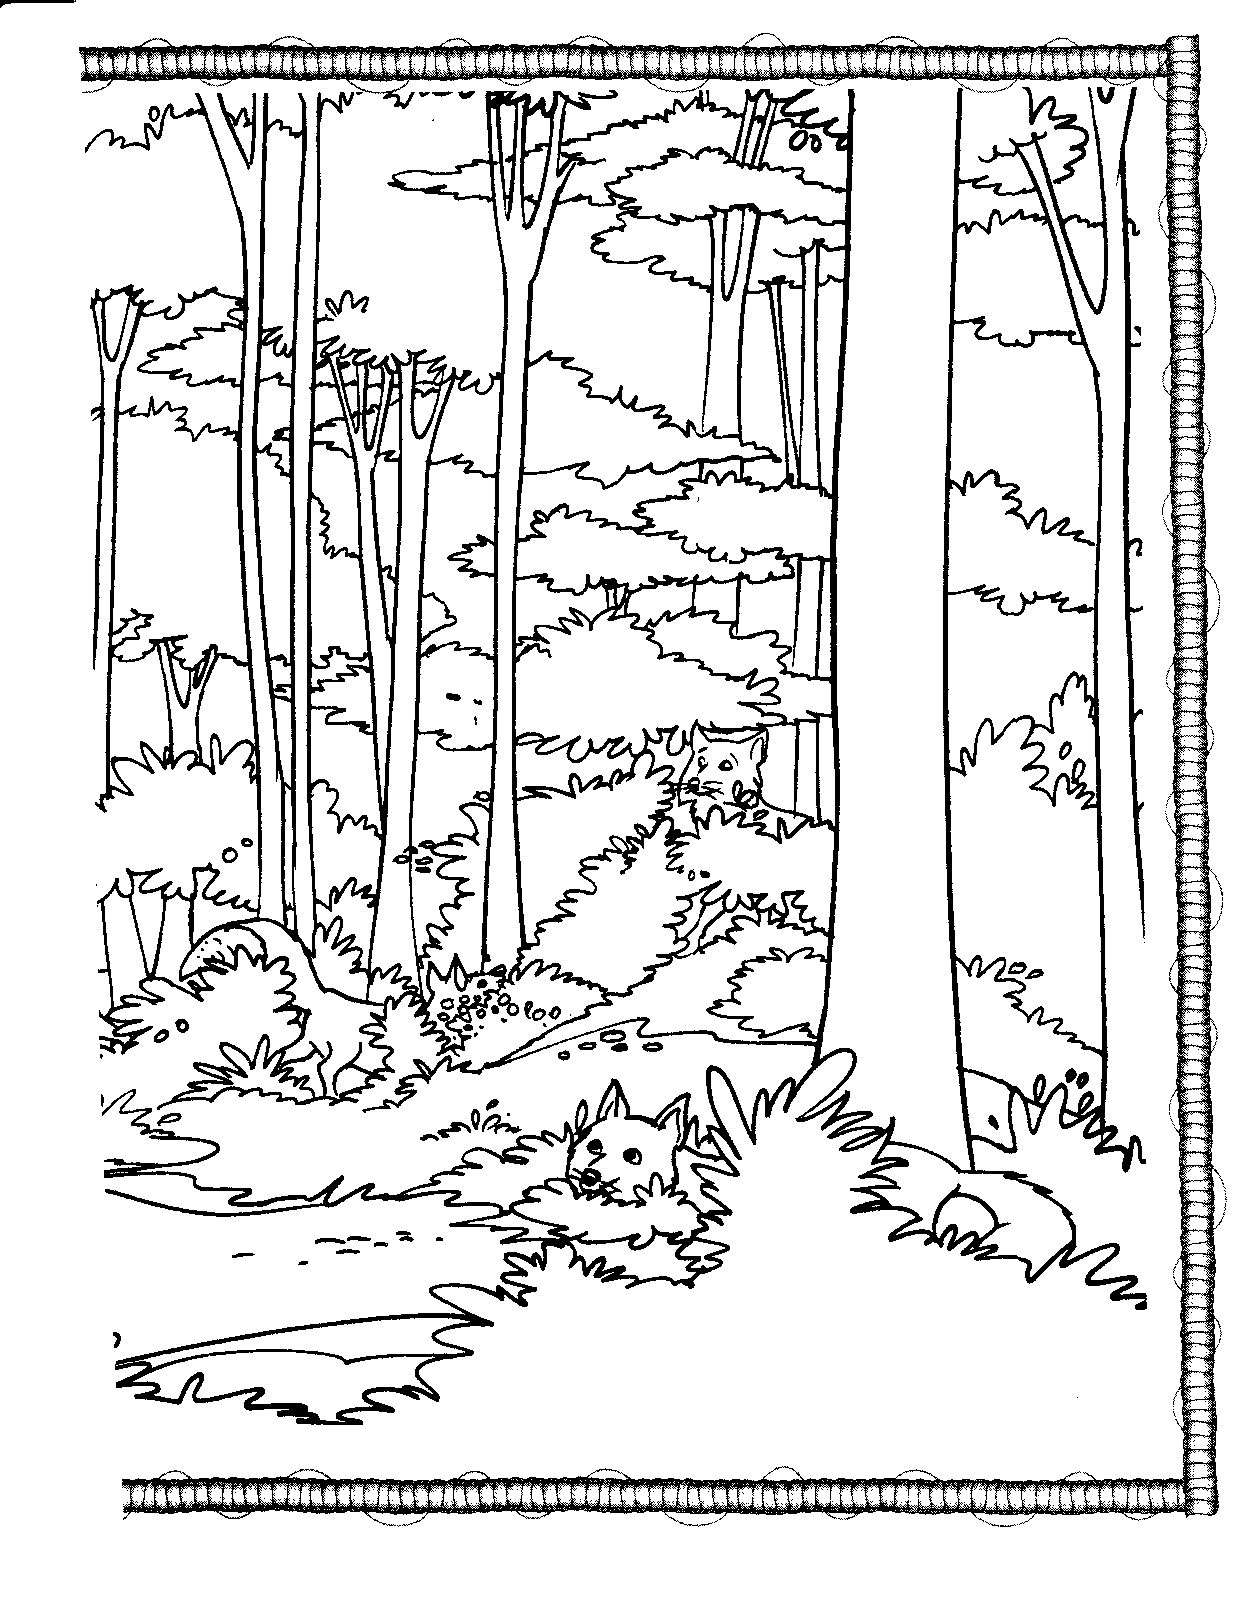 coloring, book coloring, habitat, tall trees | VISUAL ARTS ...